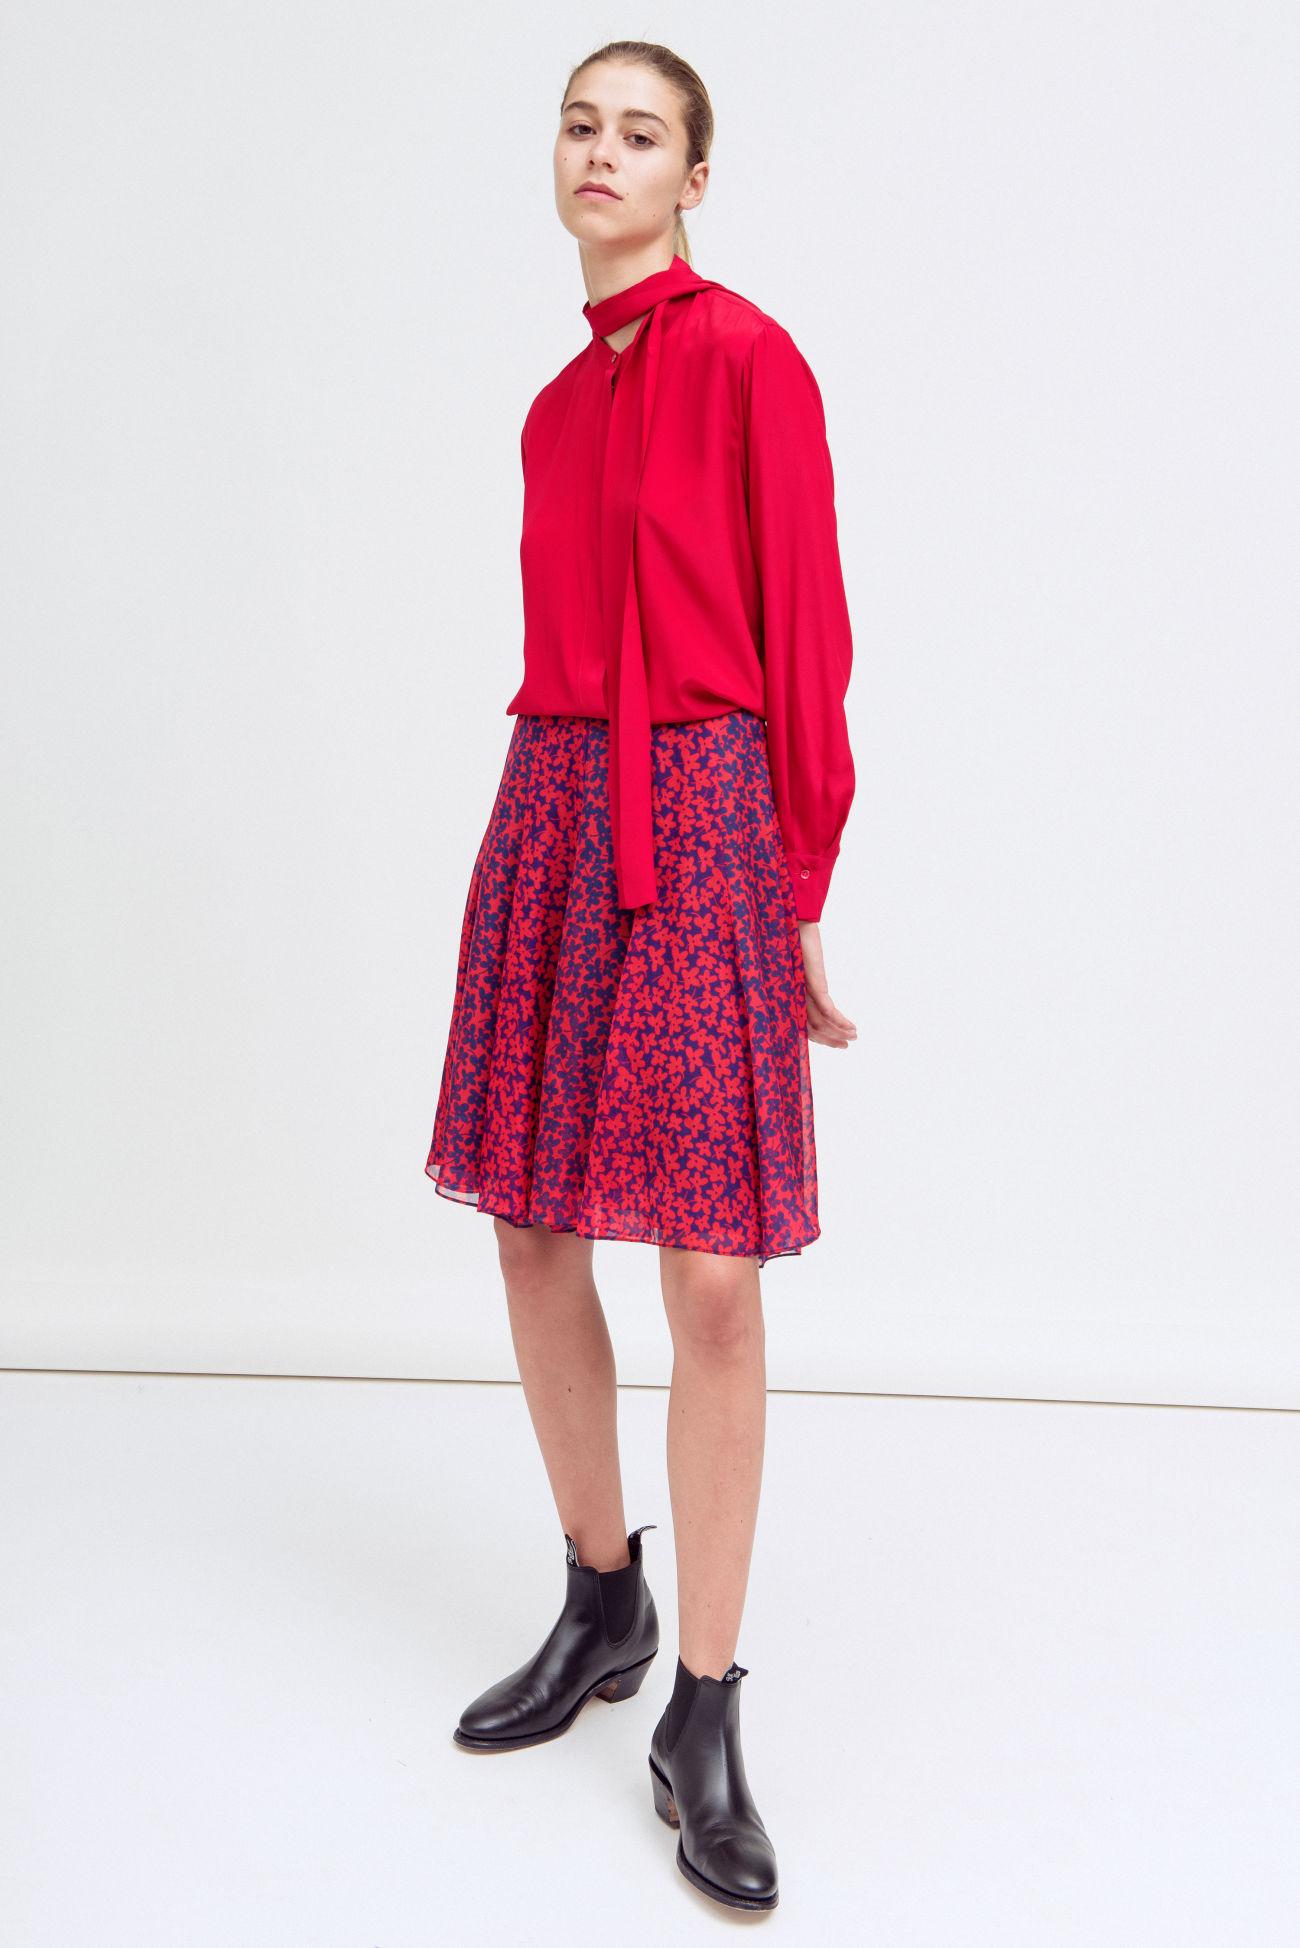 Skirt with flower print